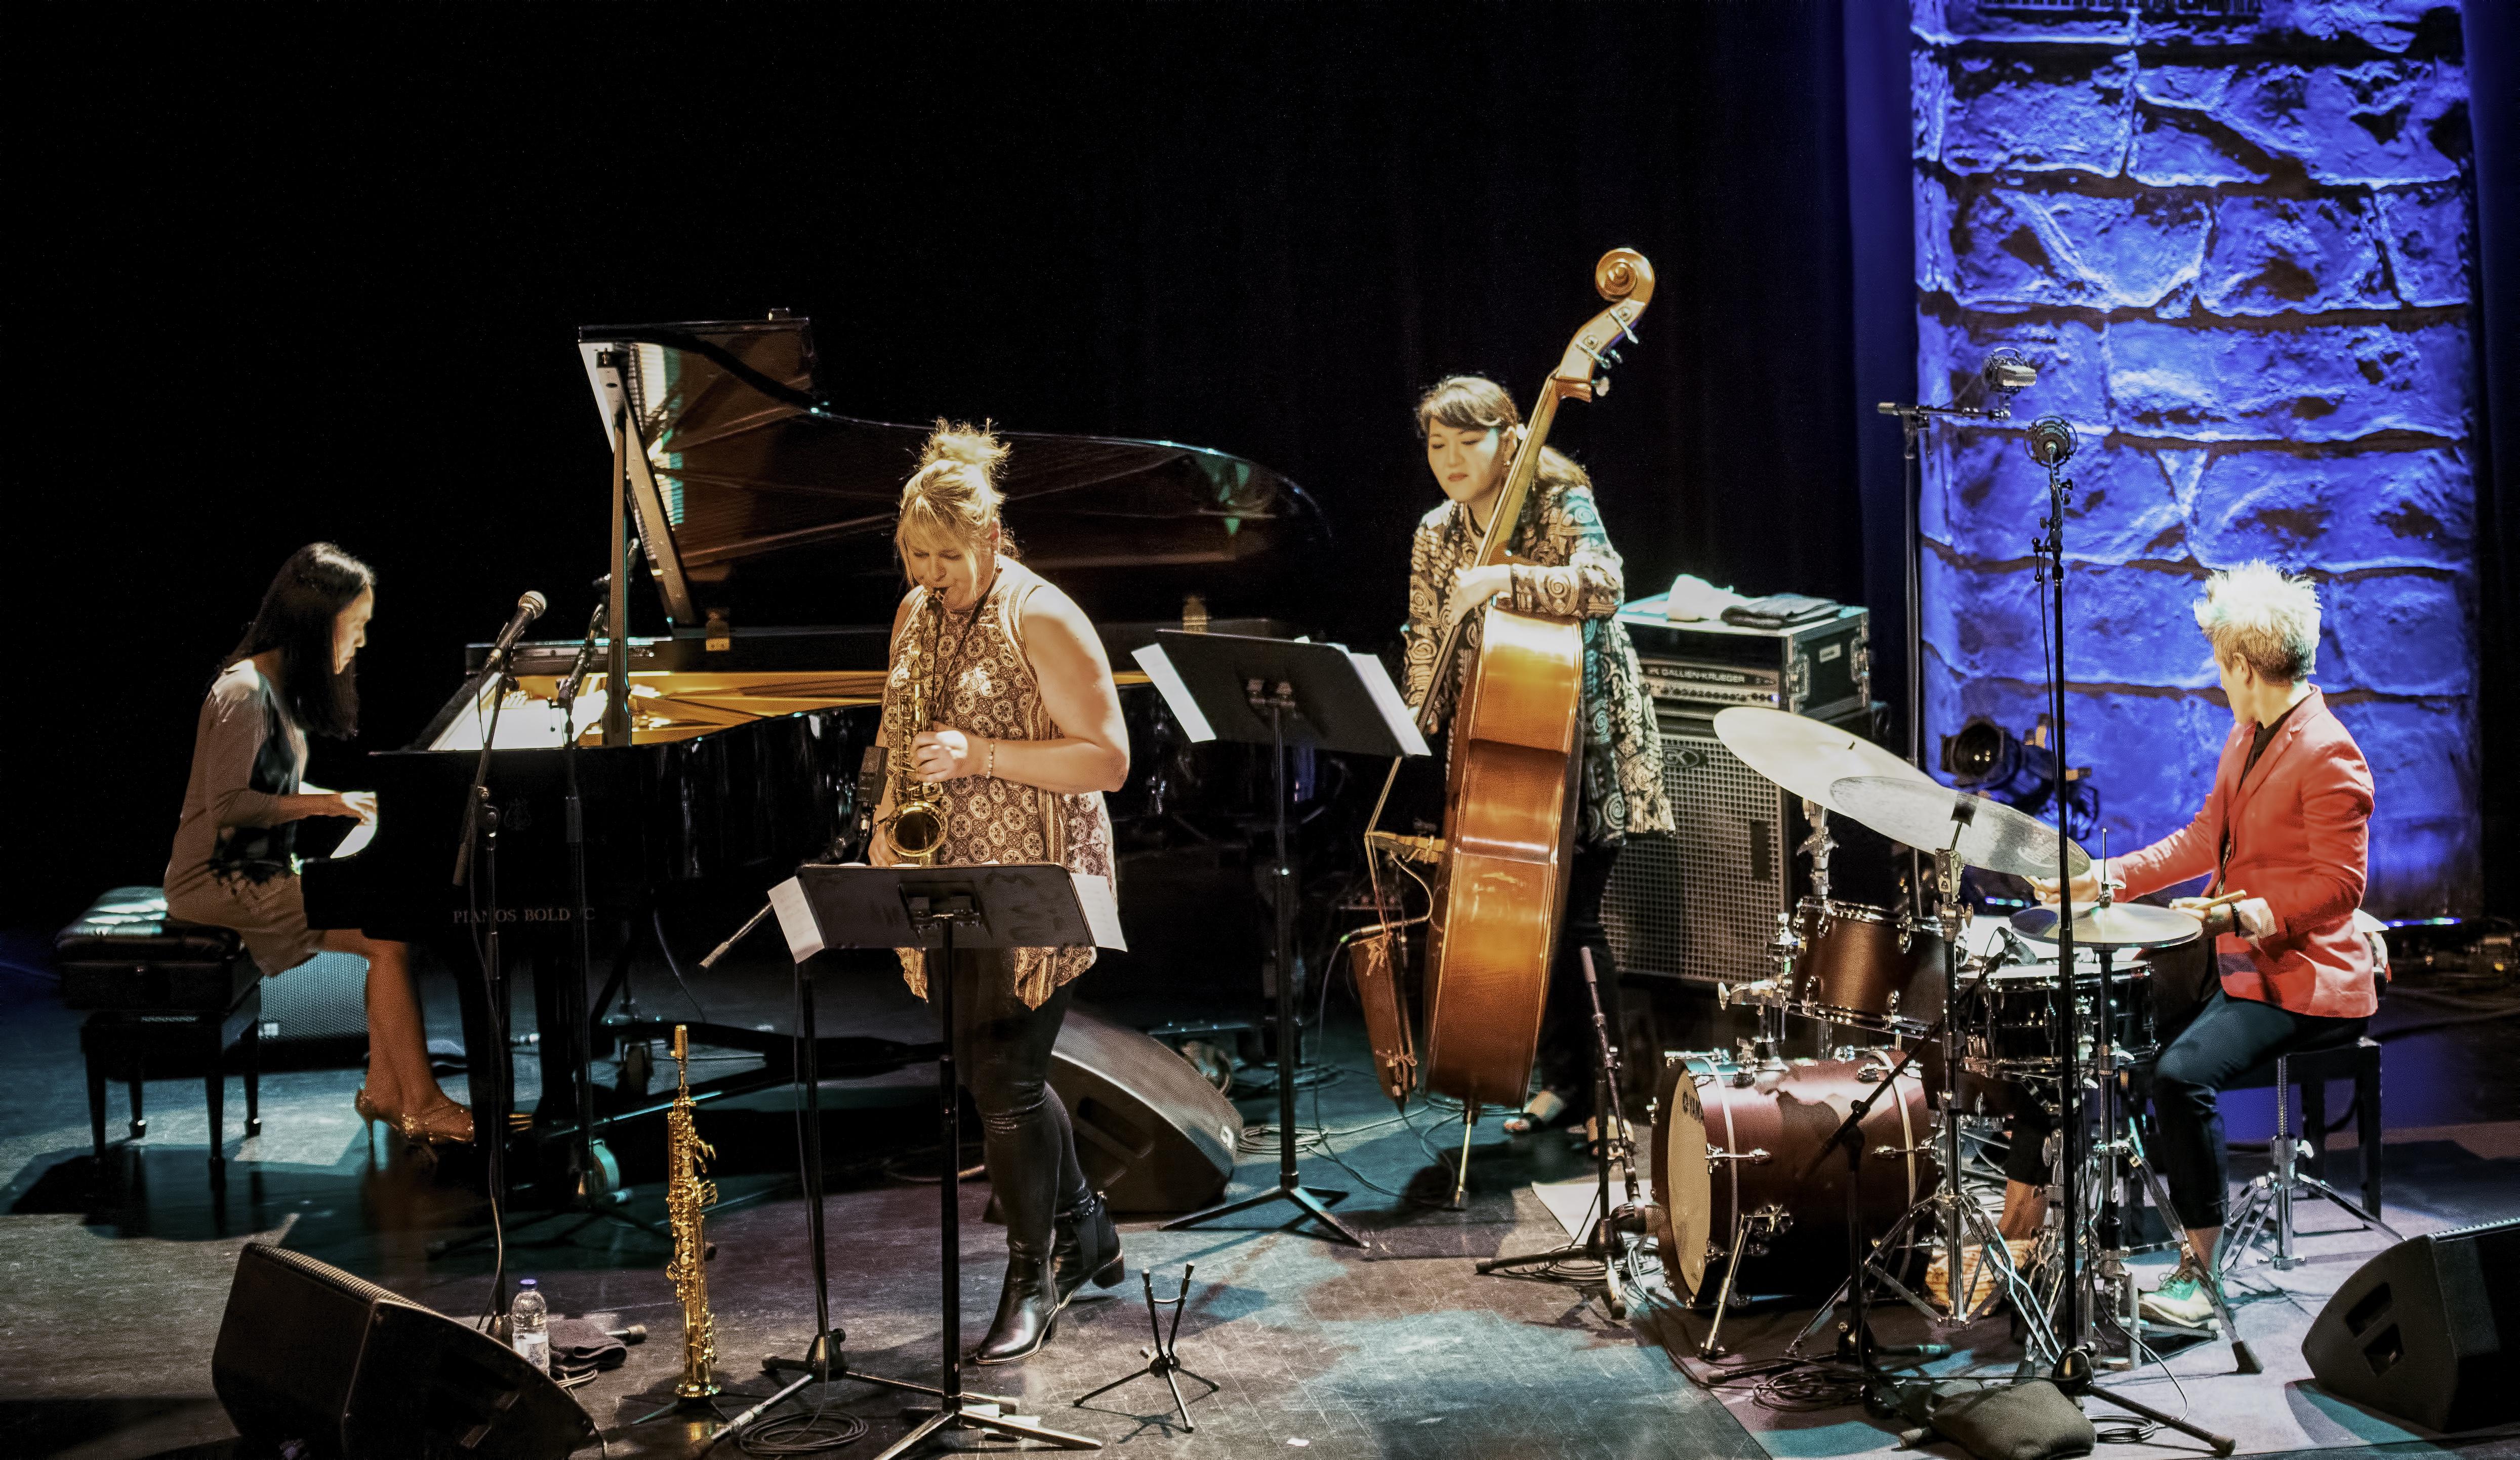 Helen Sung Christine Jensen, Noriko Ueda and Allison Miller with Christine Jensen's New York Quartet At The Montreal International Jazz Festival 2019